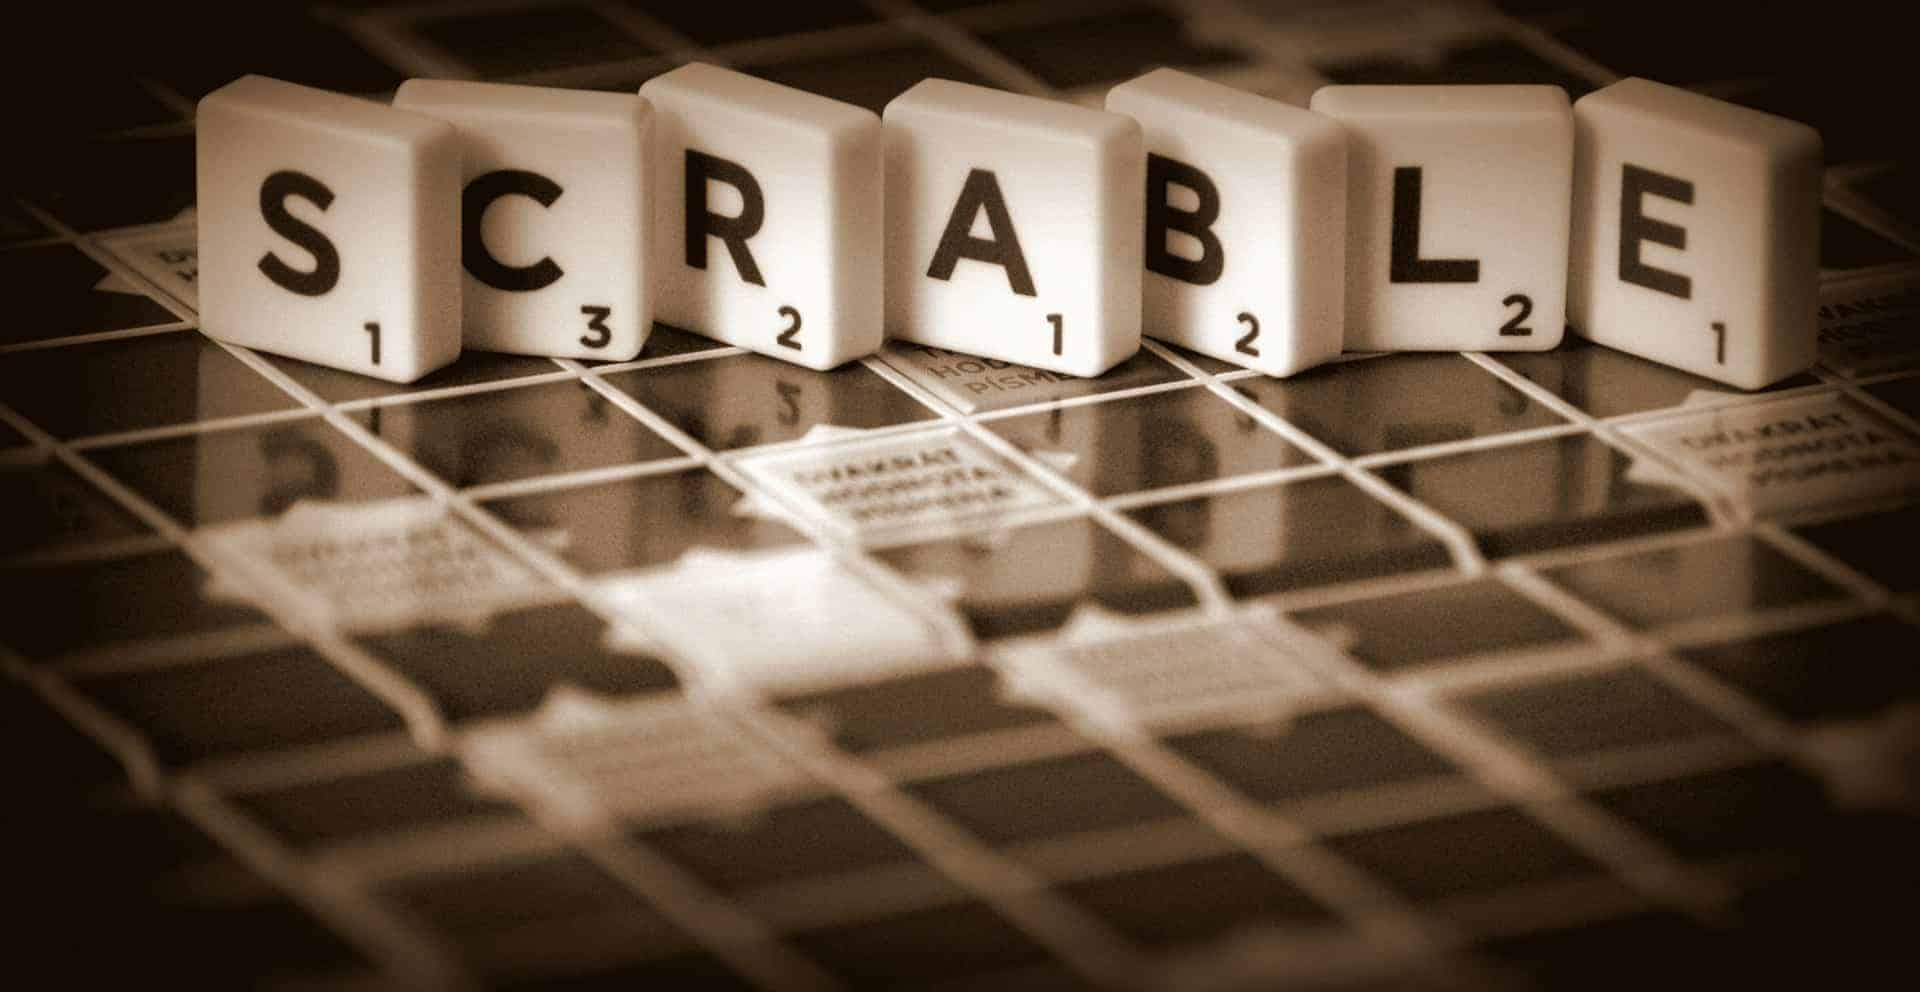 Scrabble speluitleg